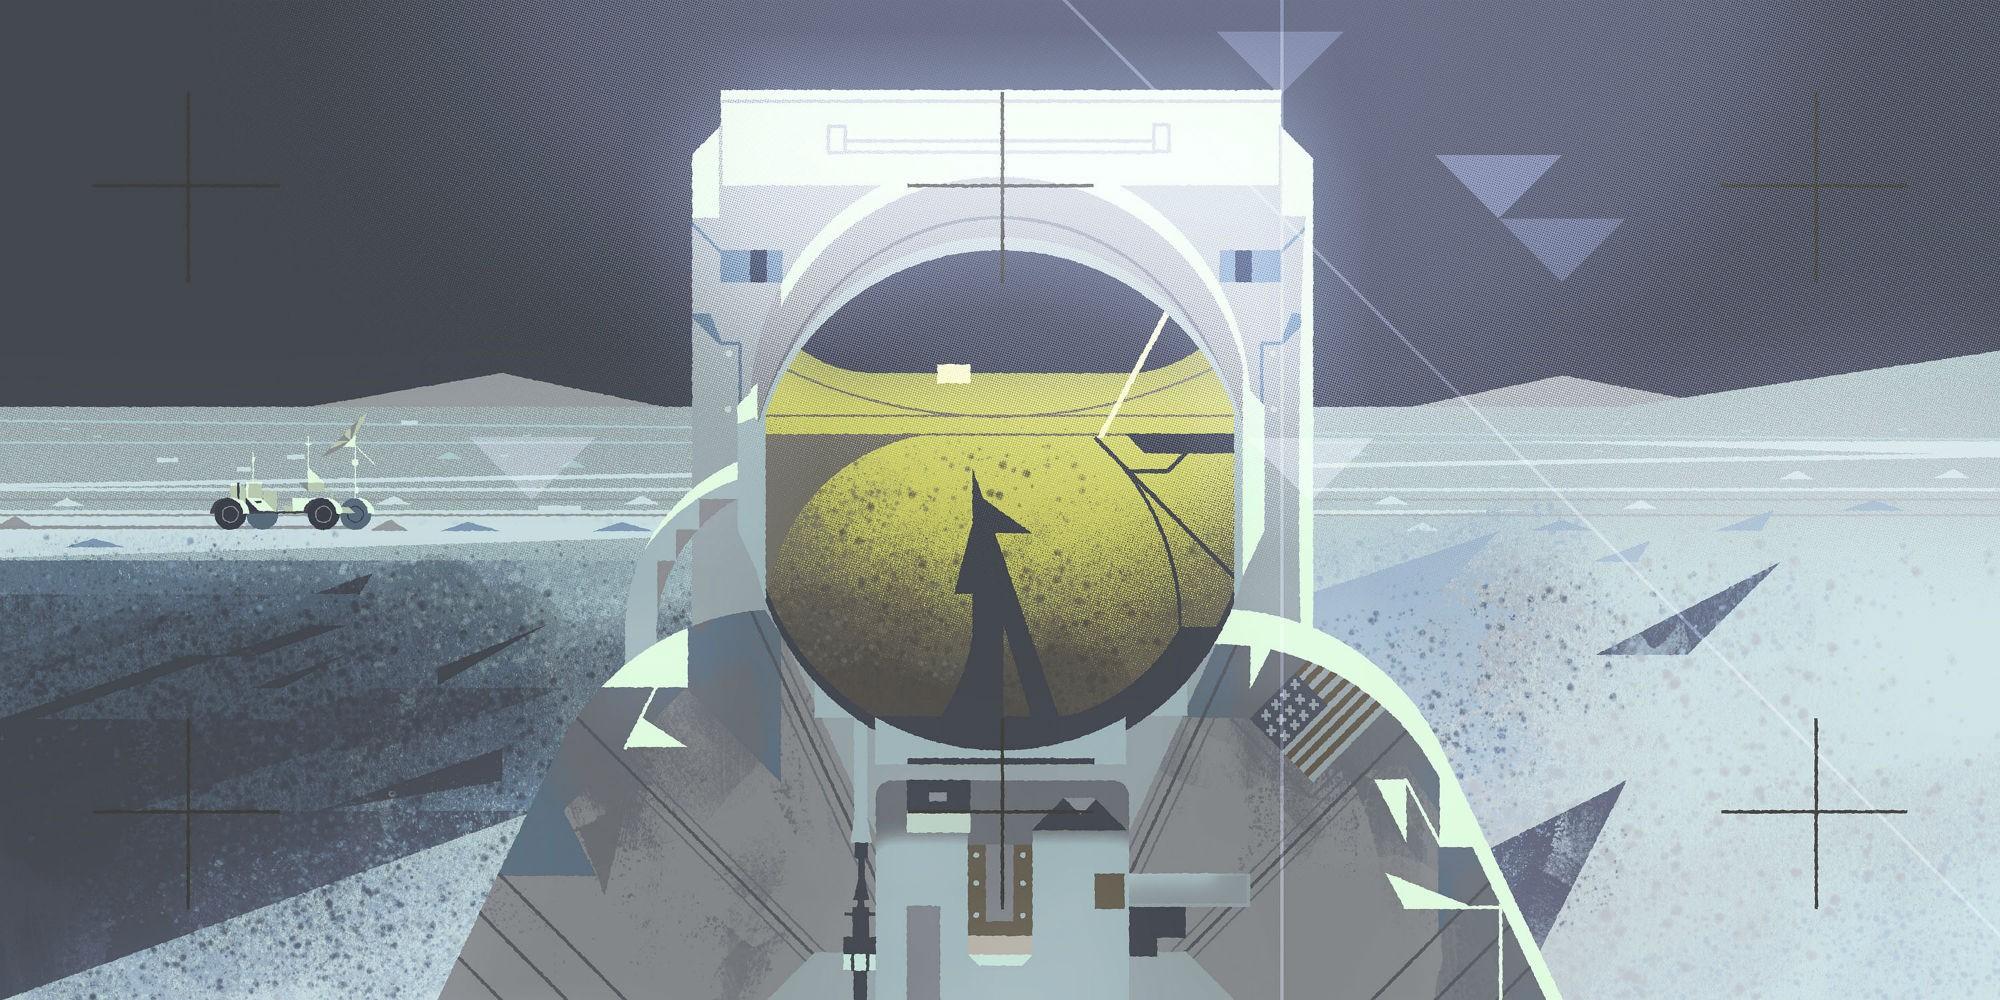 General 2000x1000 artwork astronaut Moon space spacesuit digital art